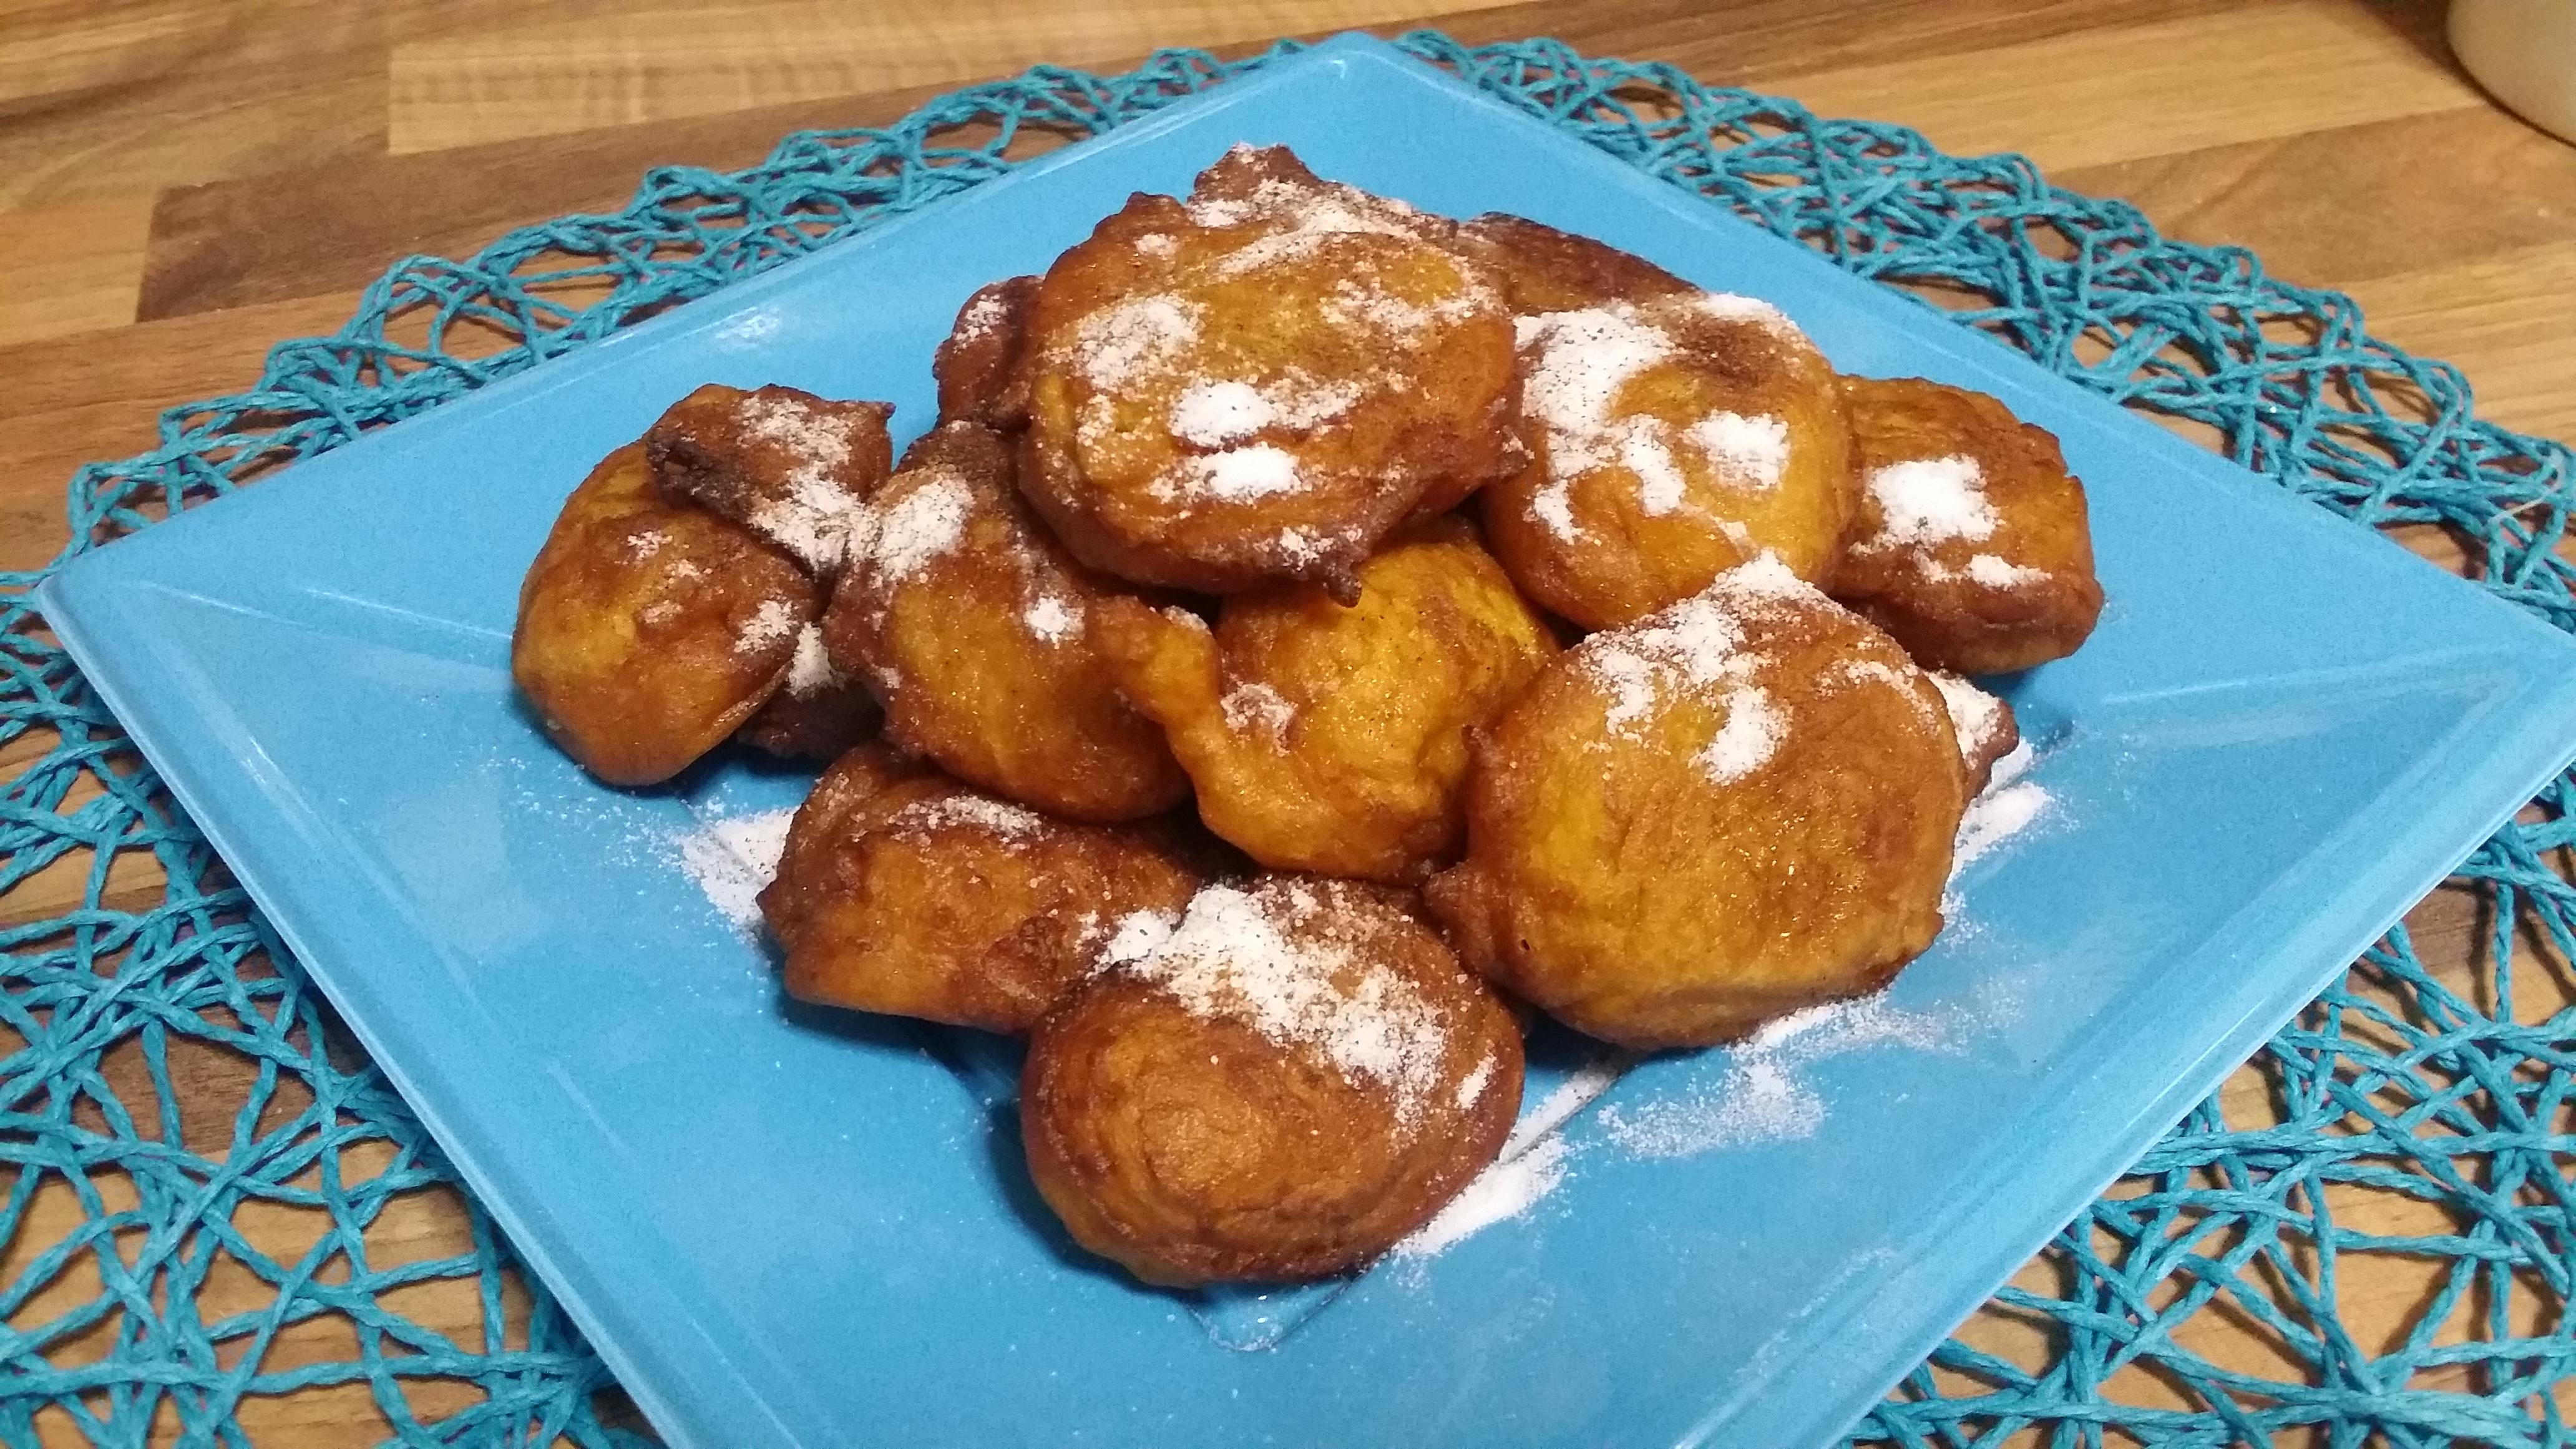 Fritos de calabaza